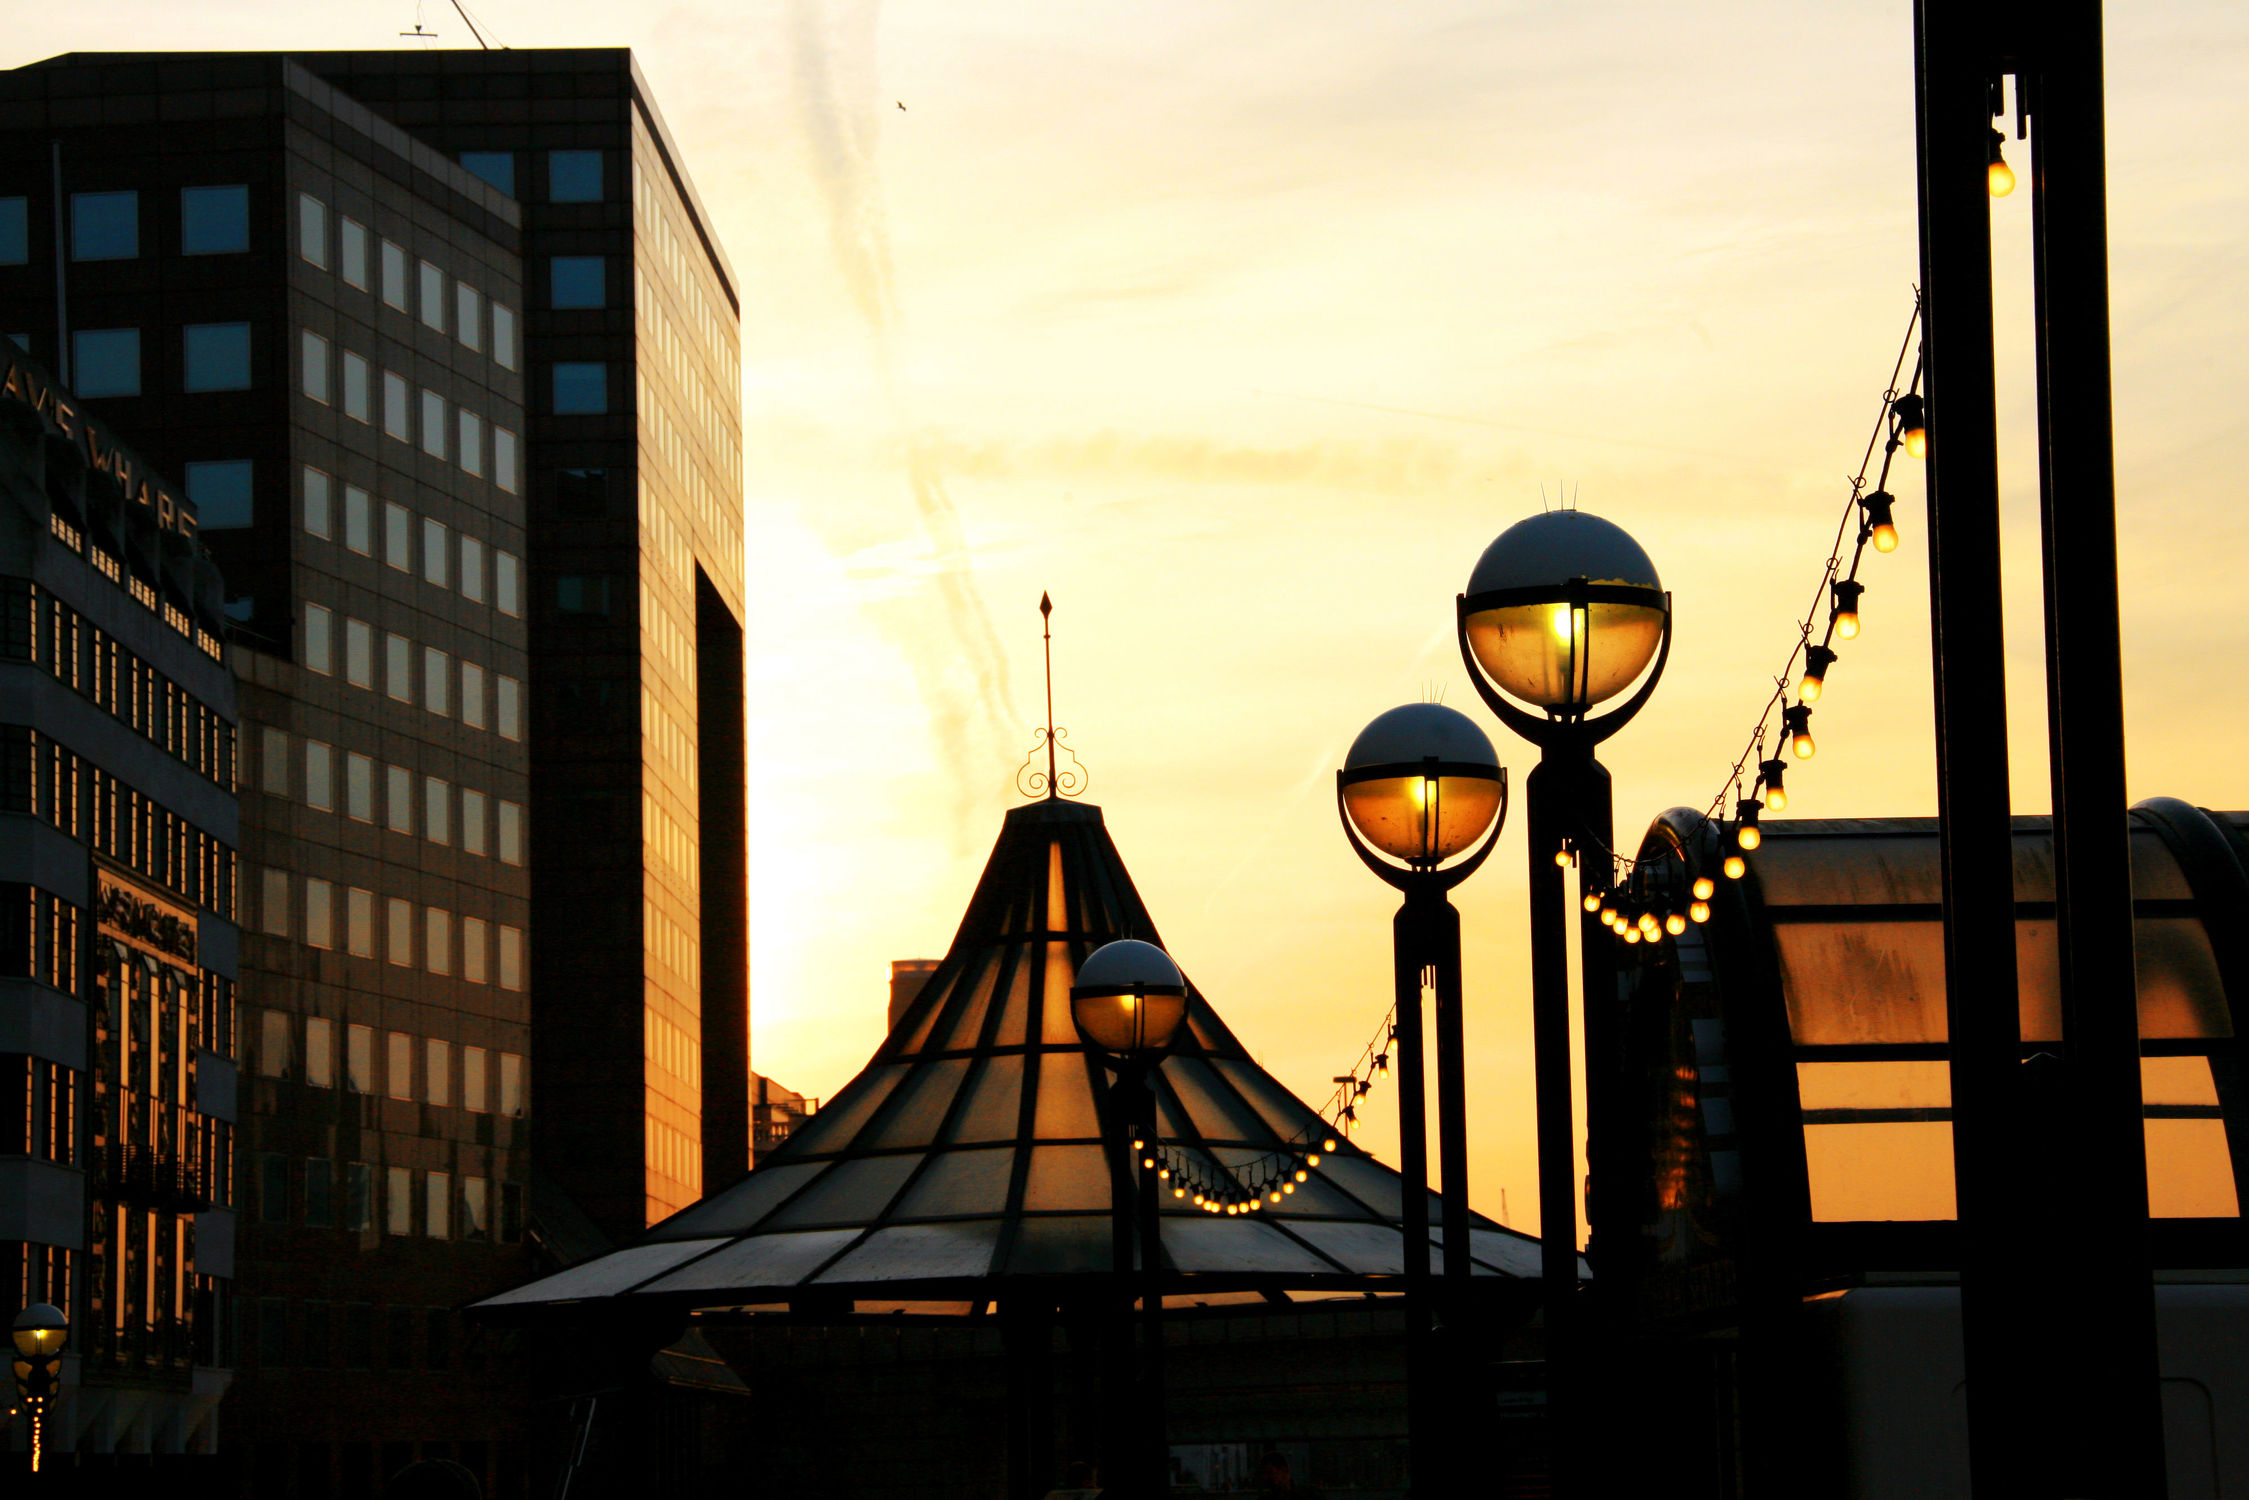 Bild mit Städte, Promenaden, Stadt, Retro, Alleen, Allee, City, Laterne, Laternen, Promenade, Stadtleben